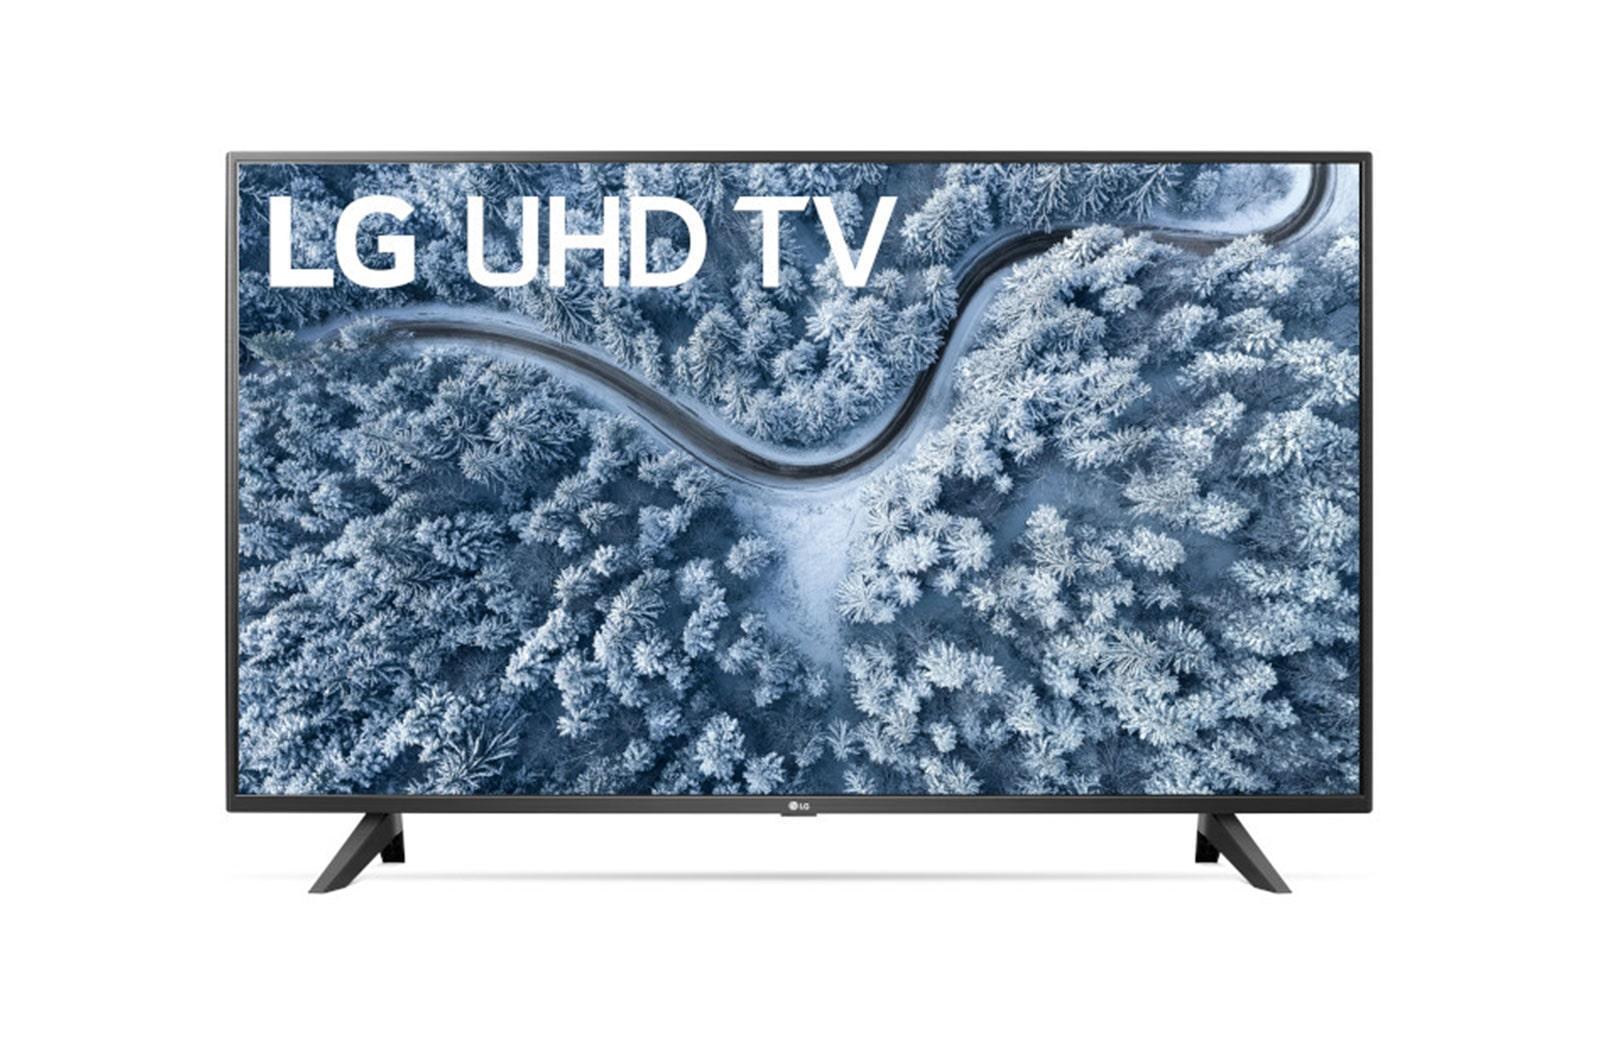 LG AppliancesLg Uhd 70 Series 55 Inch Class 4k Smart Uhd Tv (54.6'' Diag)